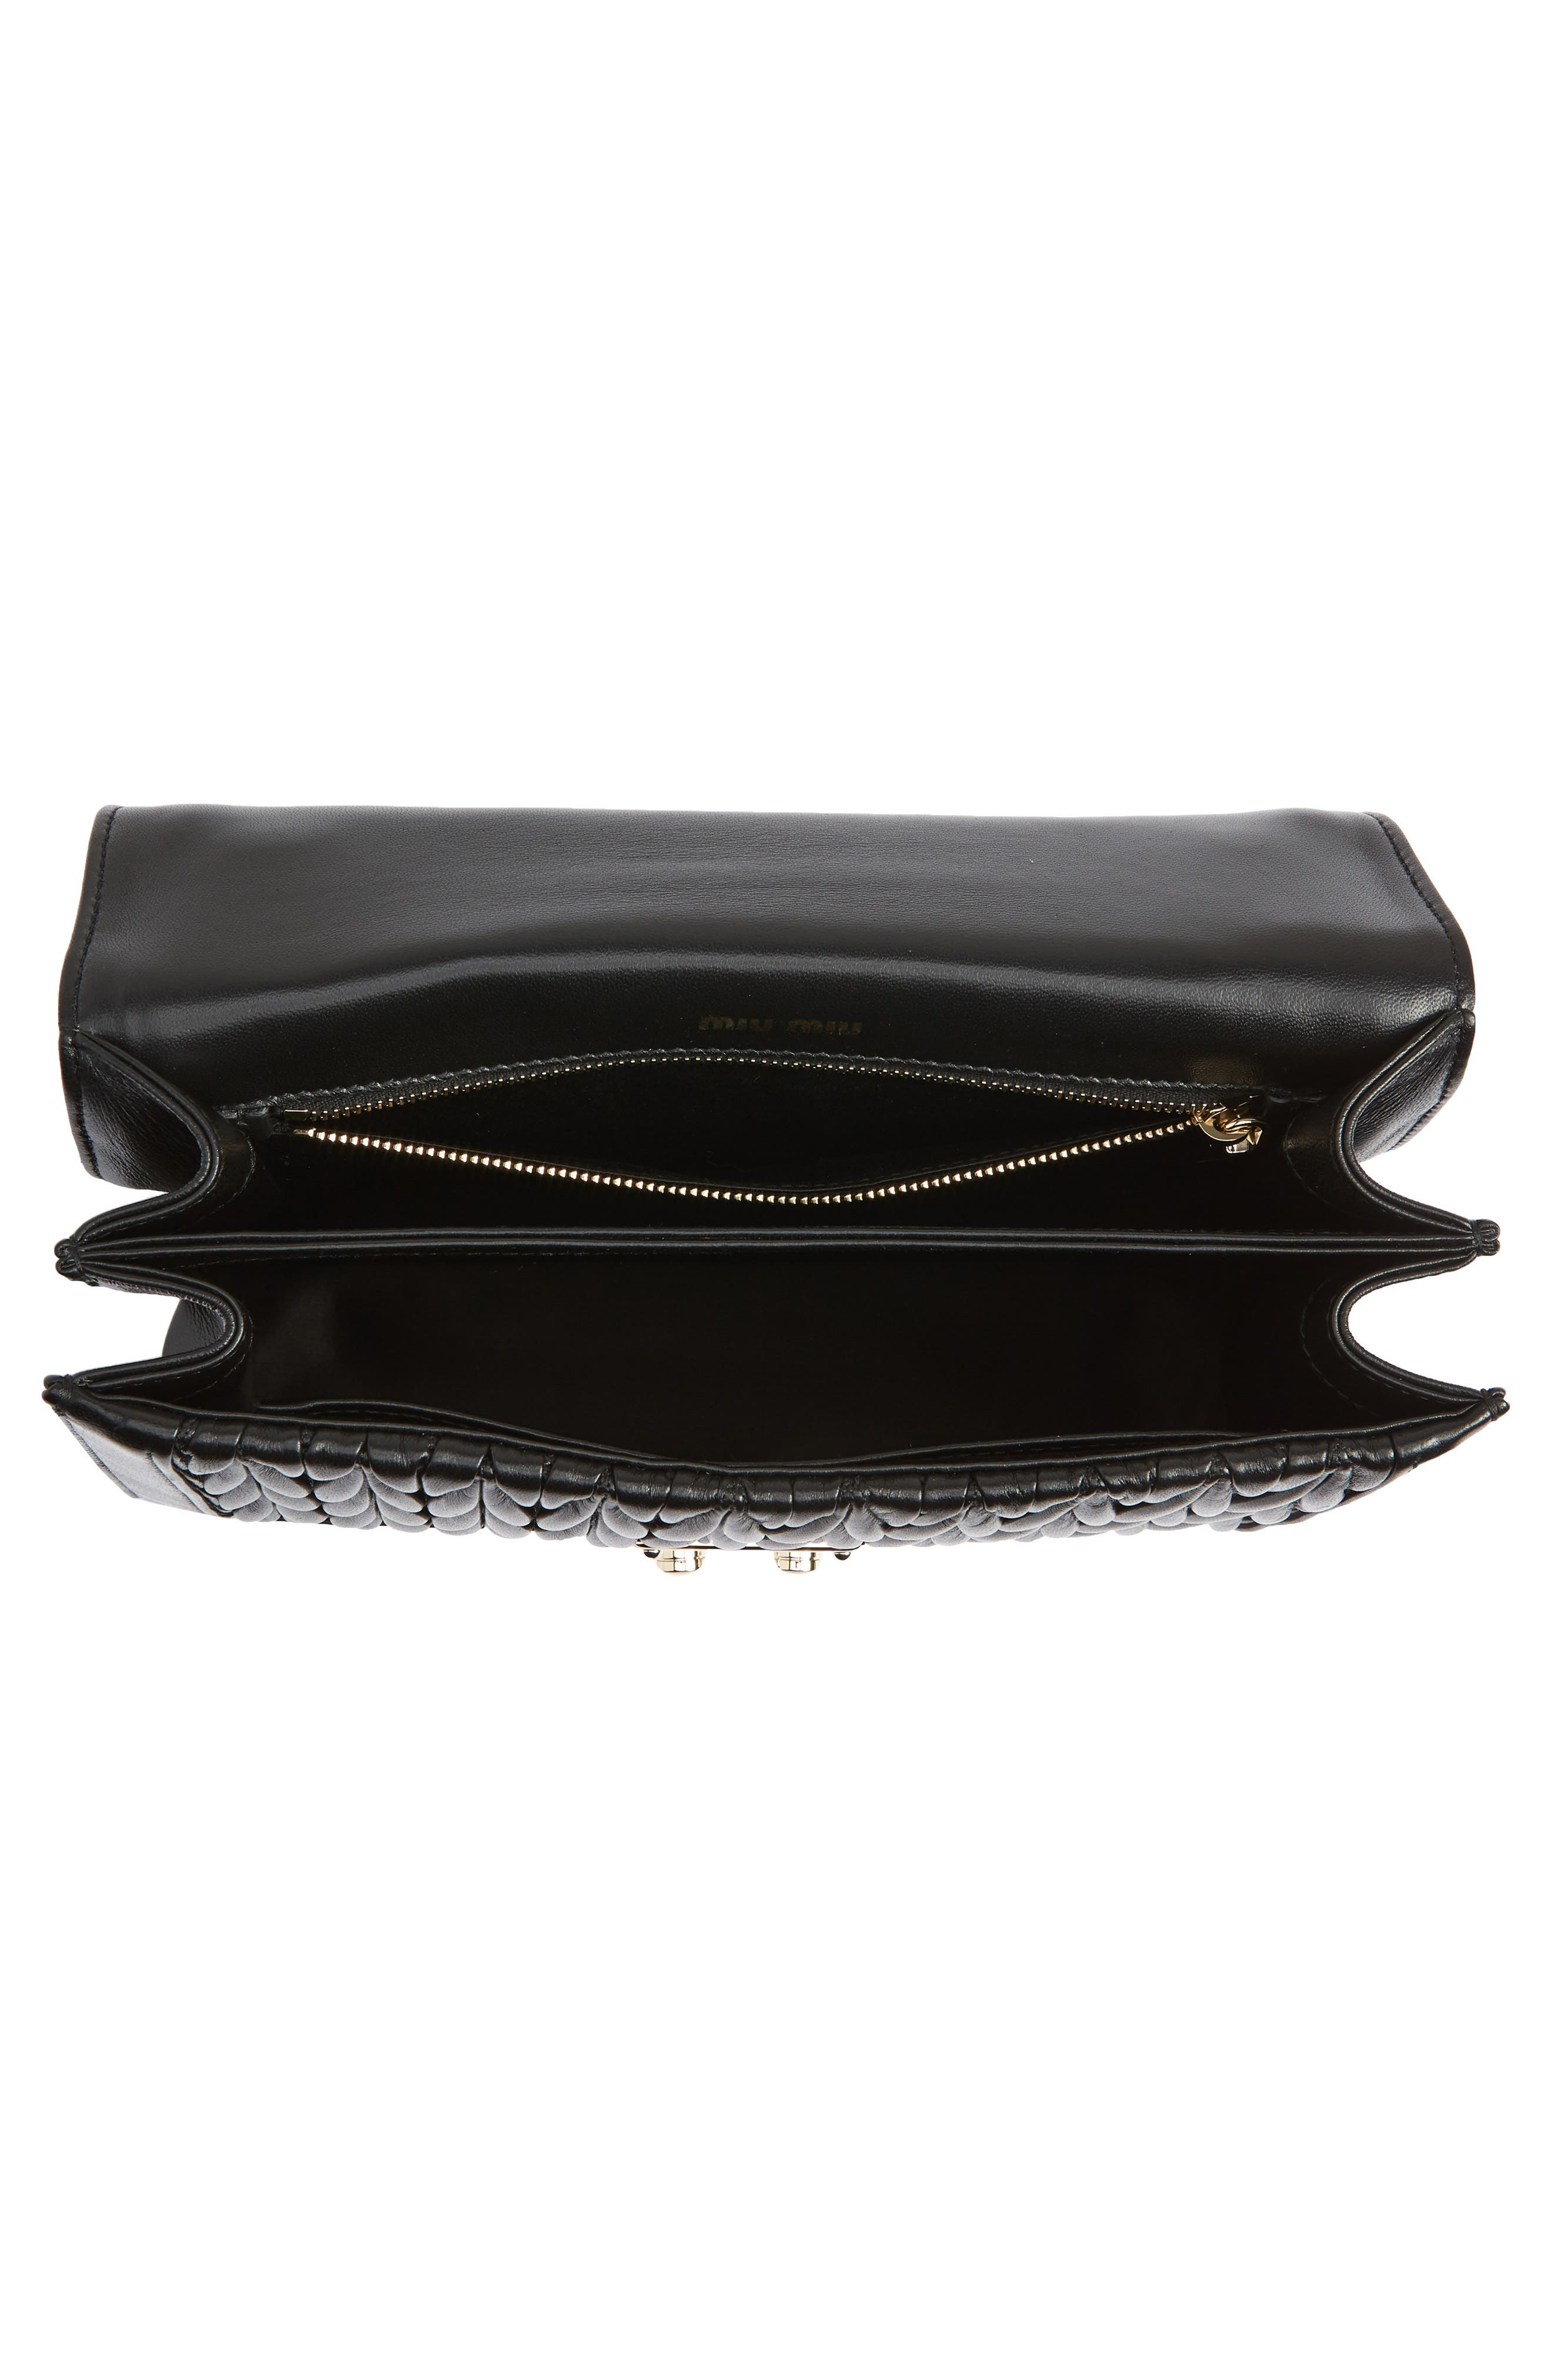 Confidential Matelassé Quilted Lambskin Leather Top Handle Bag,                             Alternate thumbnail 4, color,                             NERO